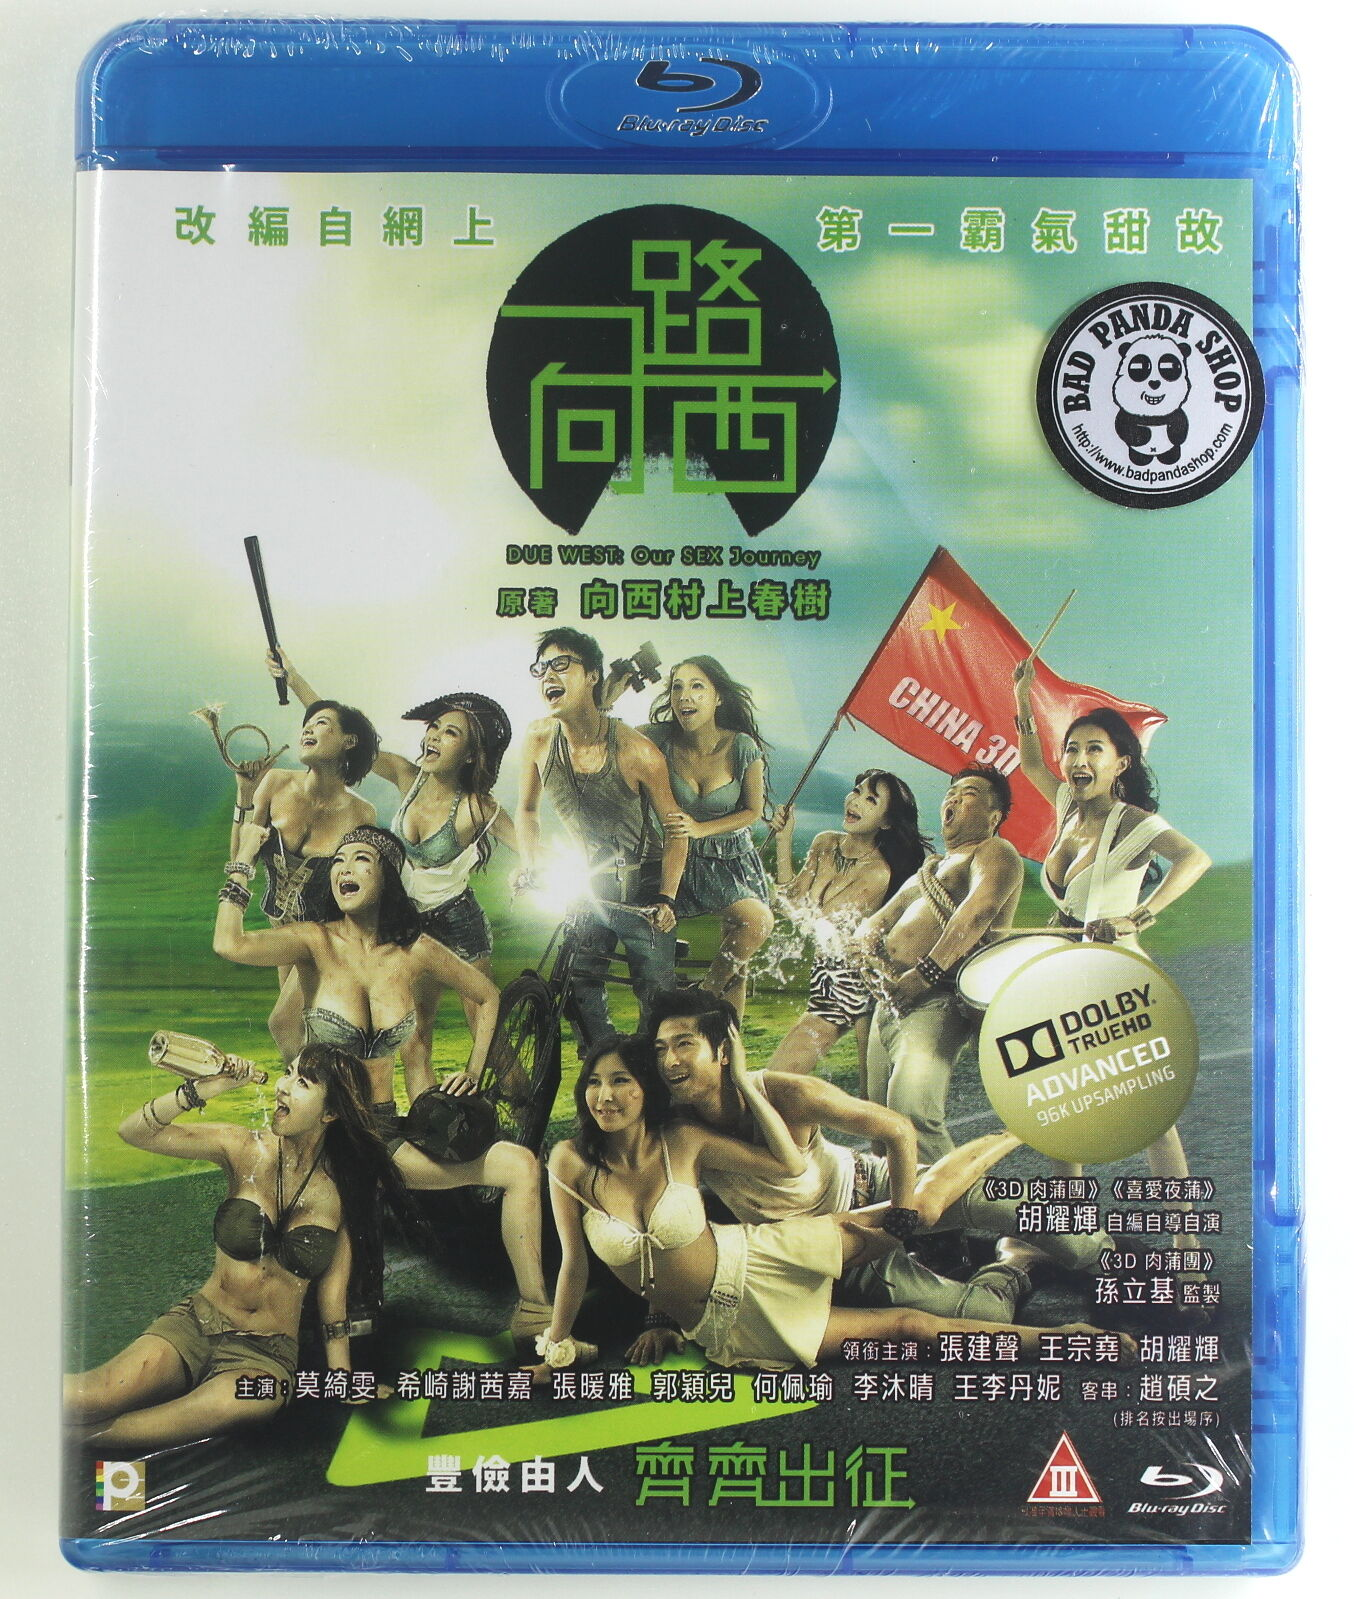 Due West Our Sex Journey Blu Ray 2d Daniella Wang Li Kizaki Jessica R0